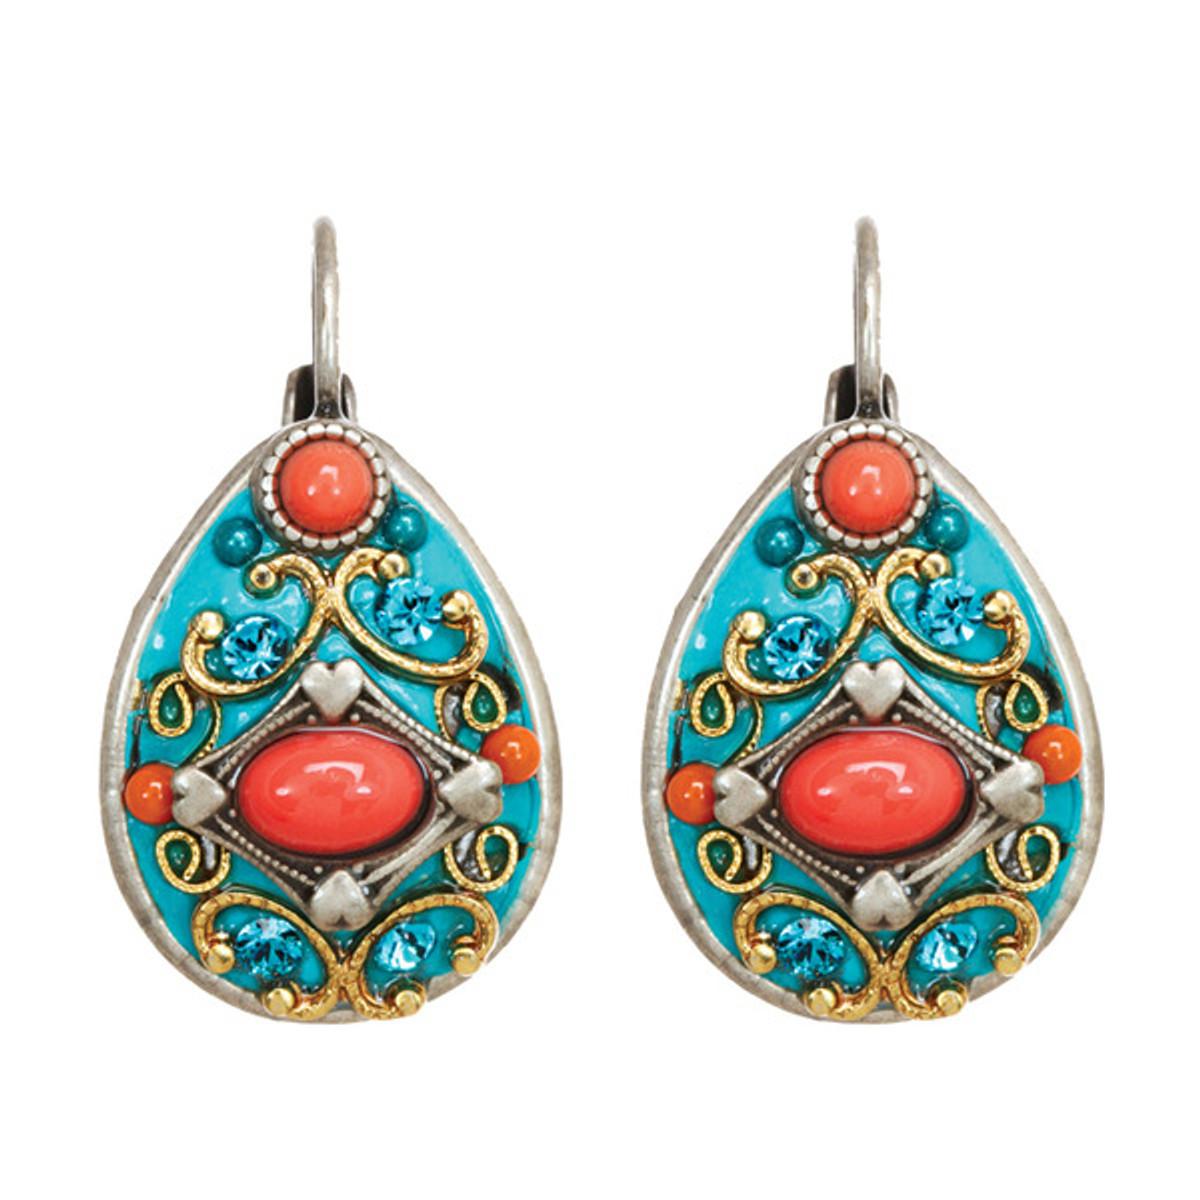 Michal Golan Jewelry Coral Sea Earrings - S7653